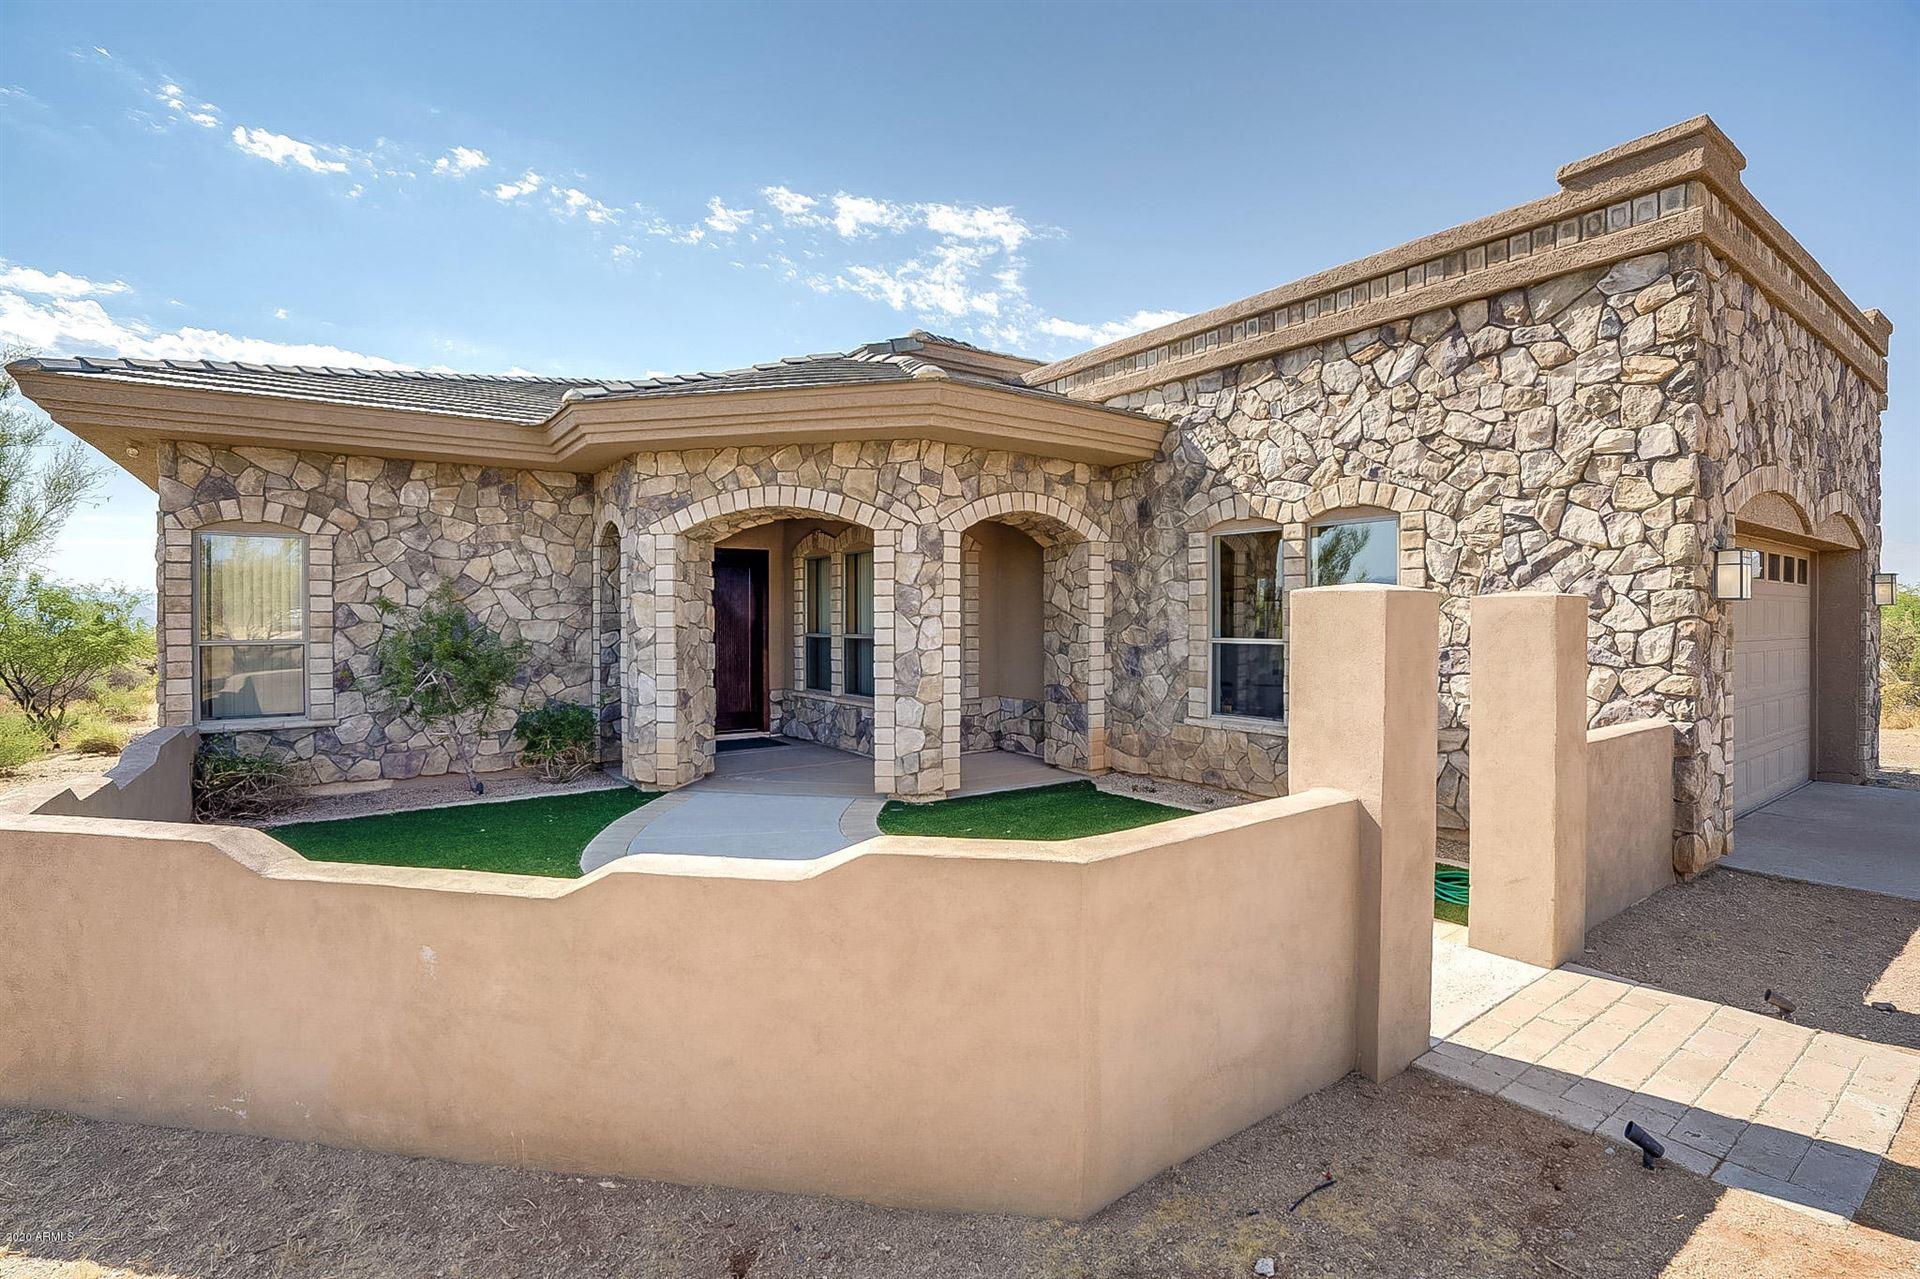 14713 E MORNING VISTA Lane, Scottsdale, AZ 85262 - #: 6032165